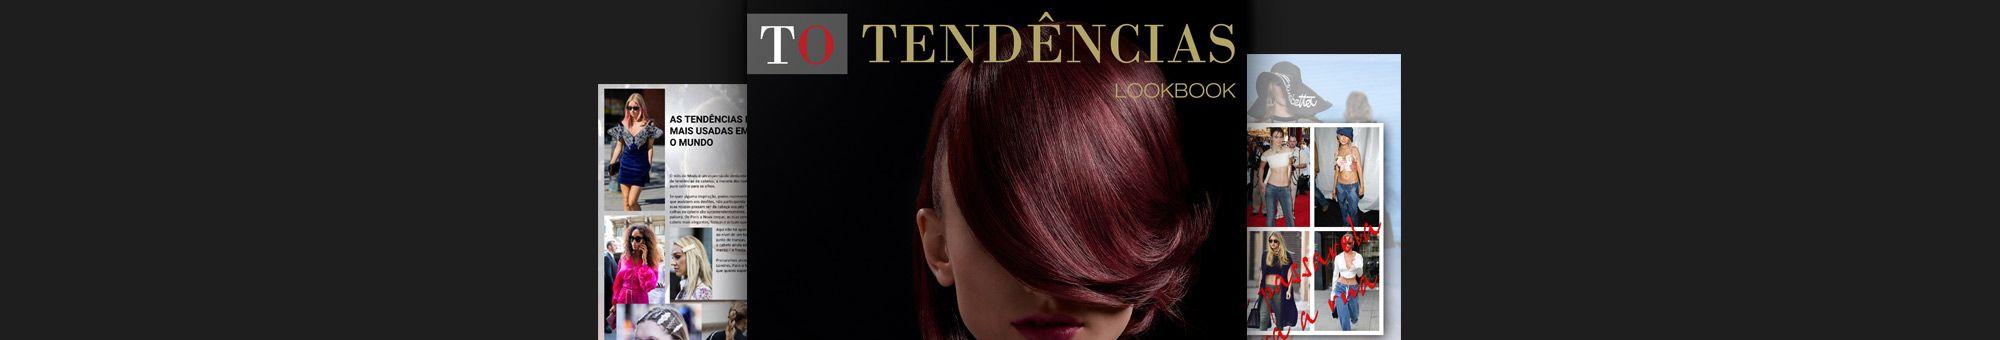 Tendências Lookbook - Cabelos & Beleza 13